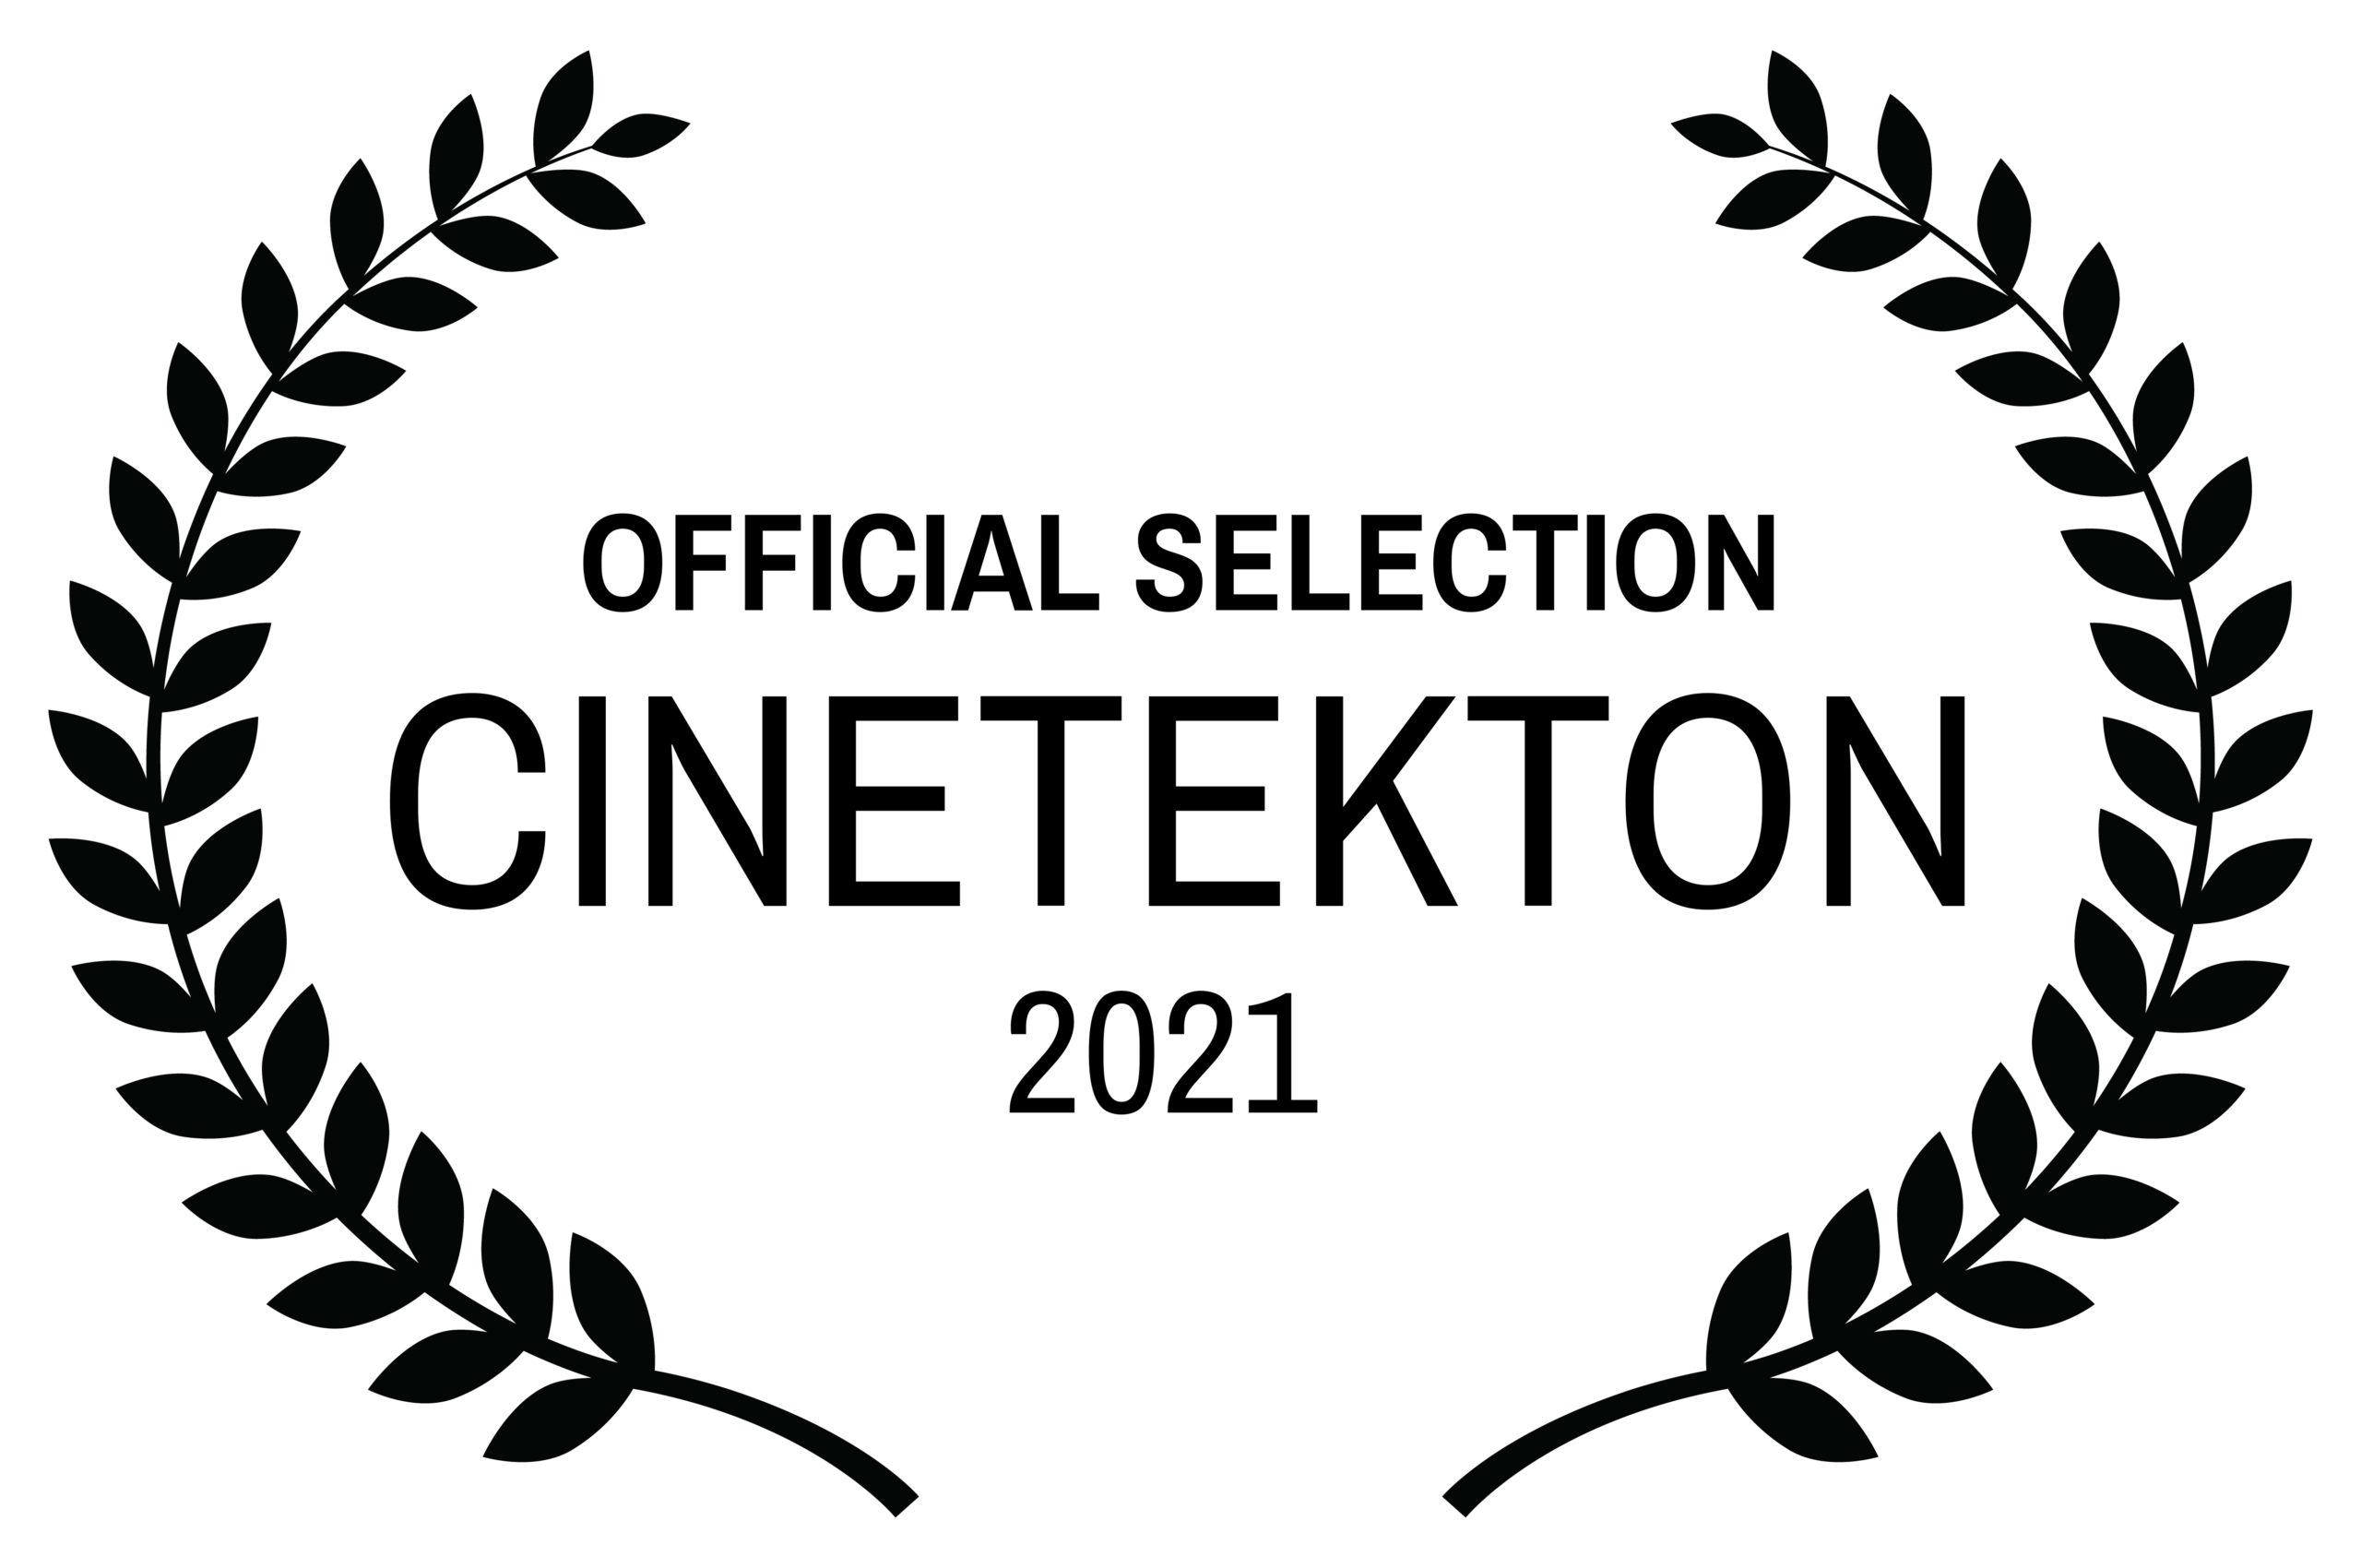 OFFICIALSELECTION-CINETEKTON-2021kopie